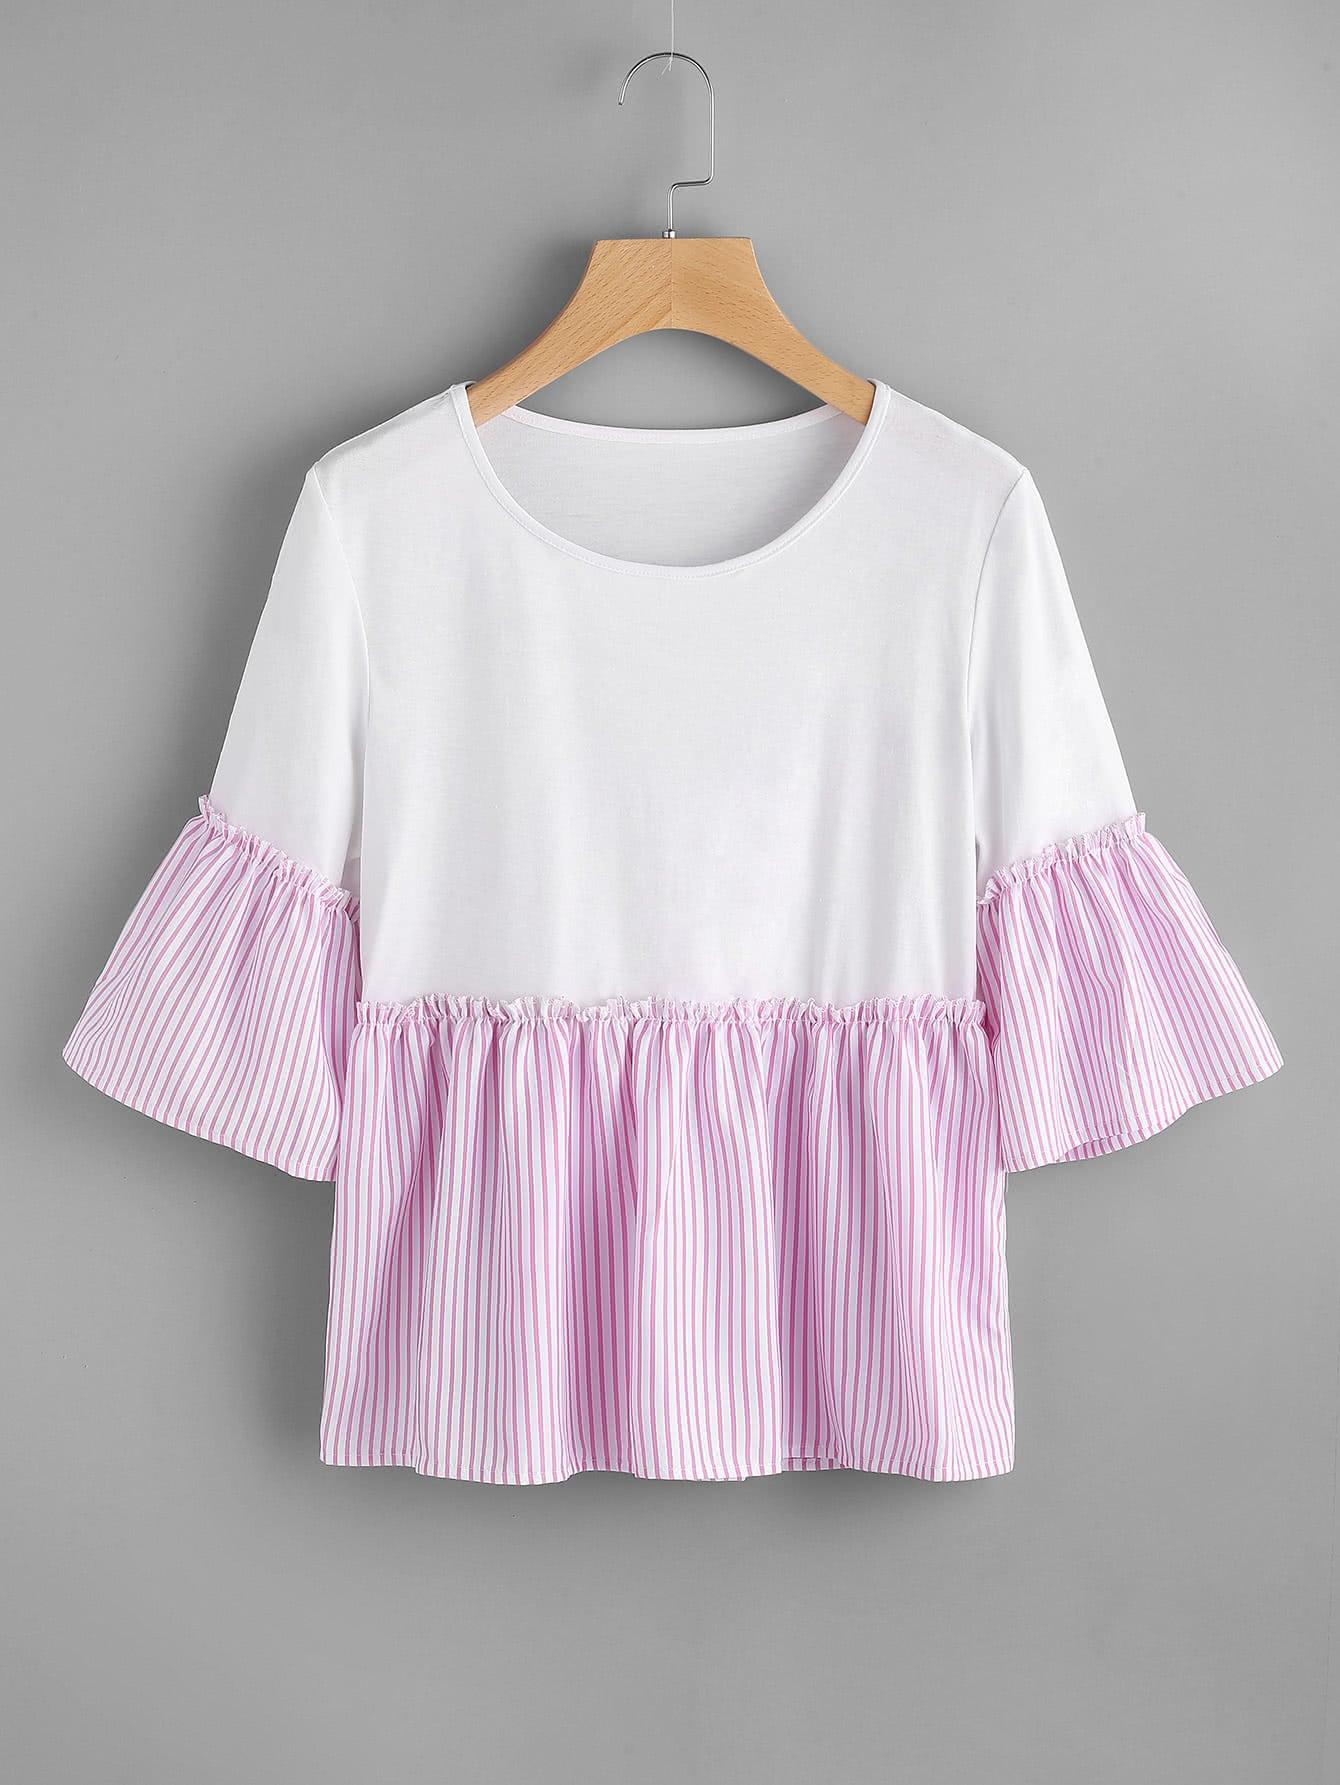 Contrast Striped Trim T-shirt tee170718001